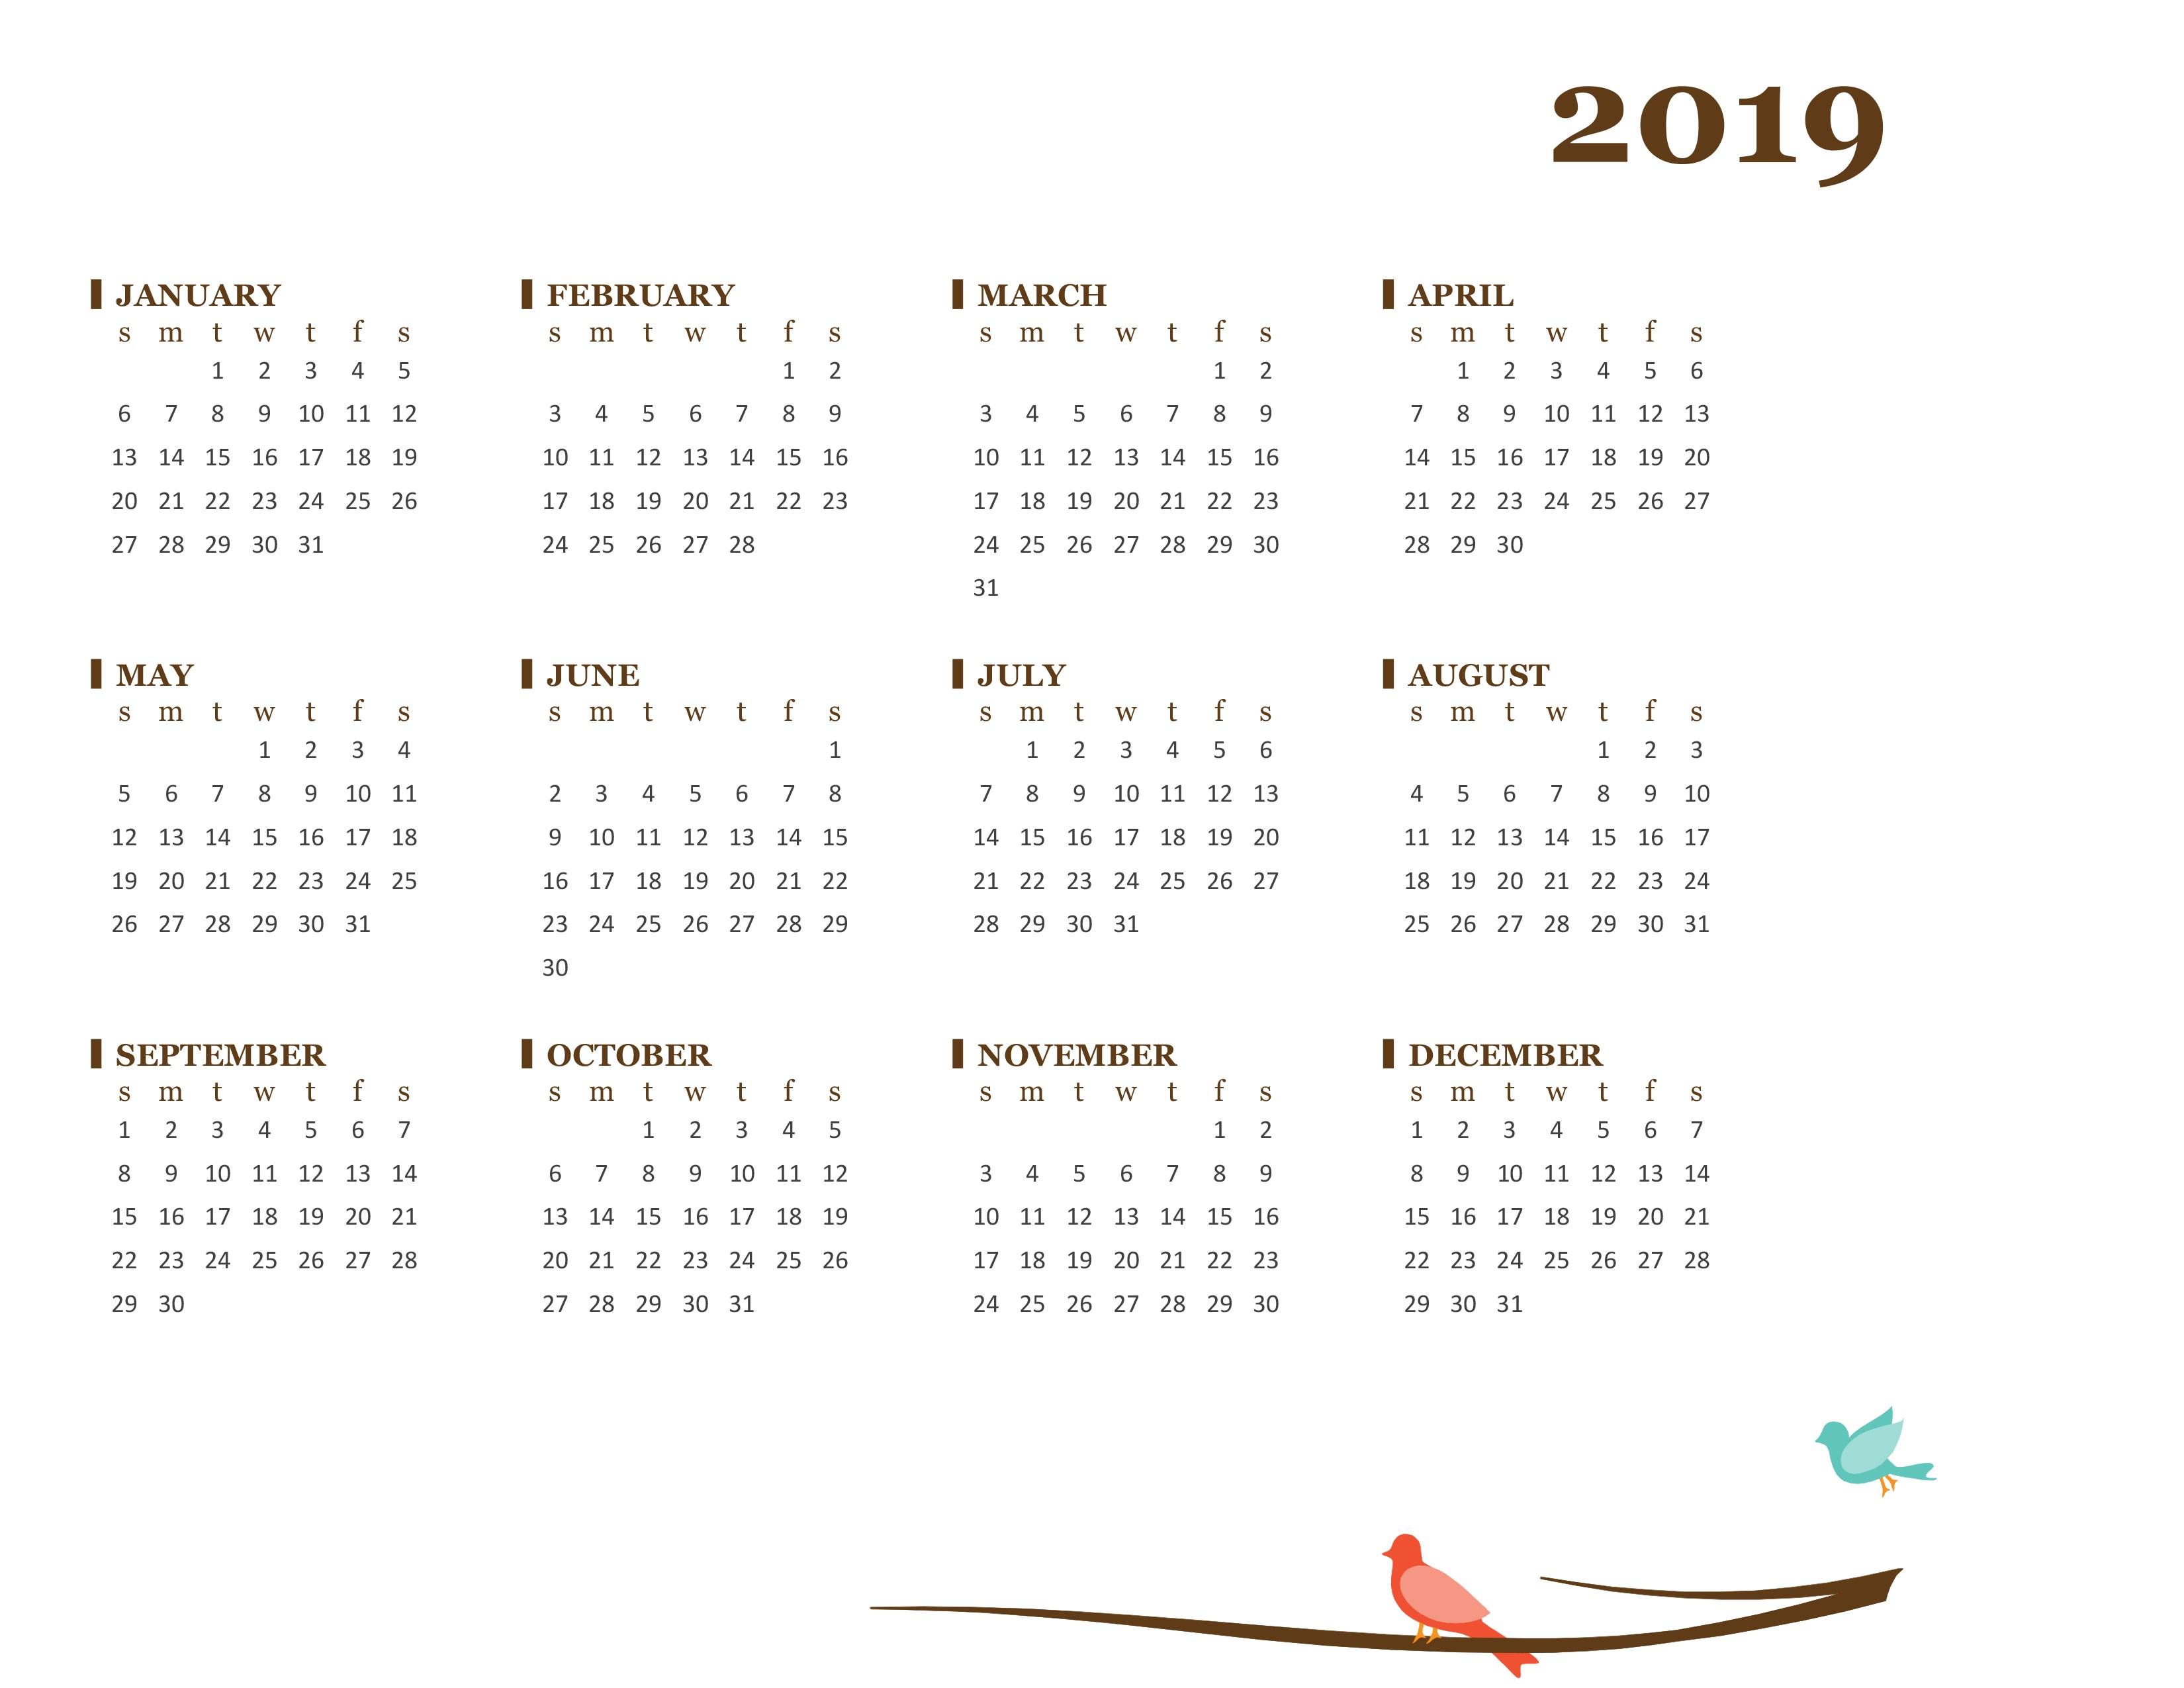 2019 Yearly Calendar (Sun-Sat)